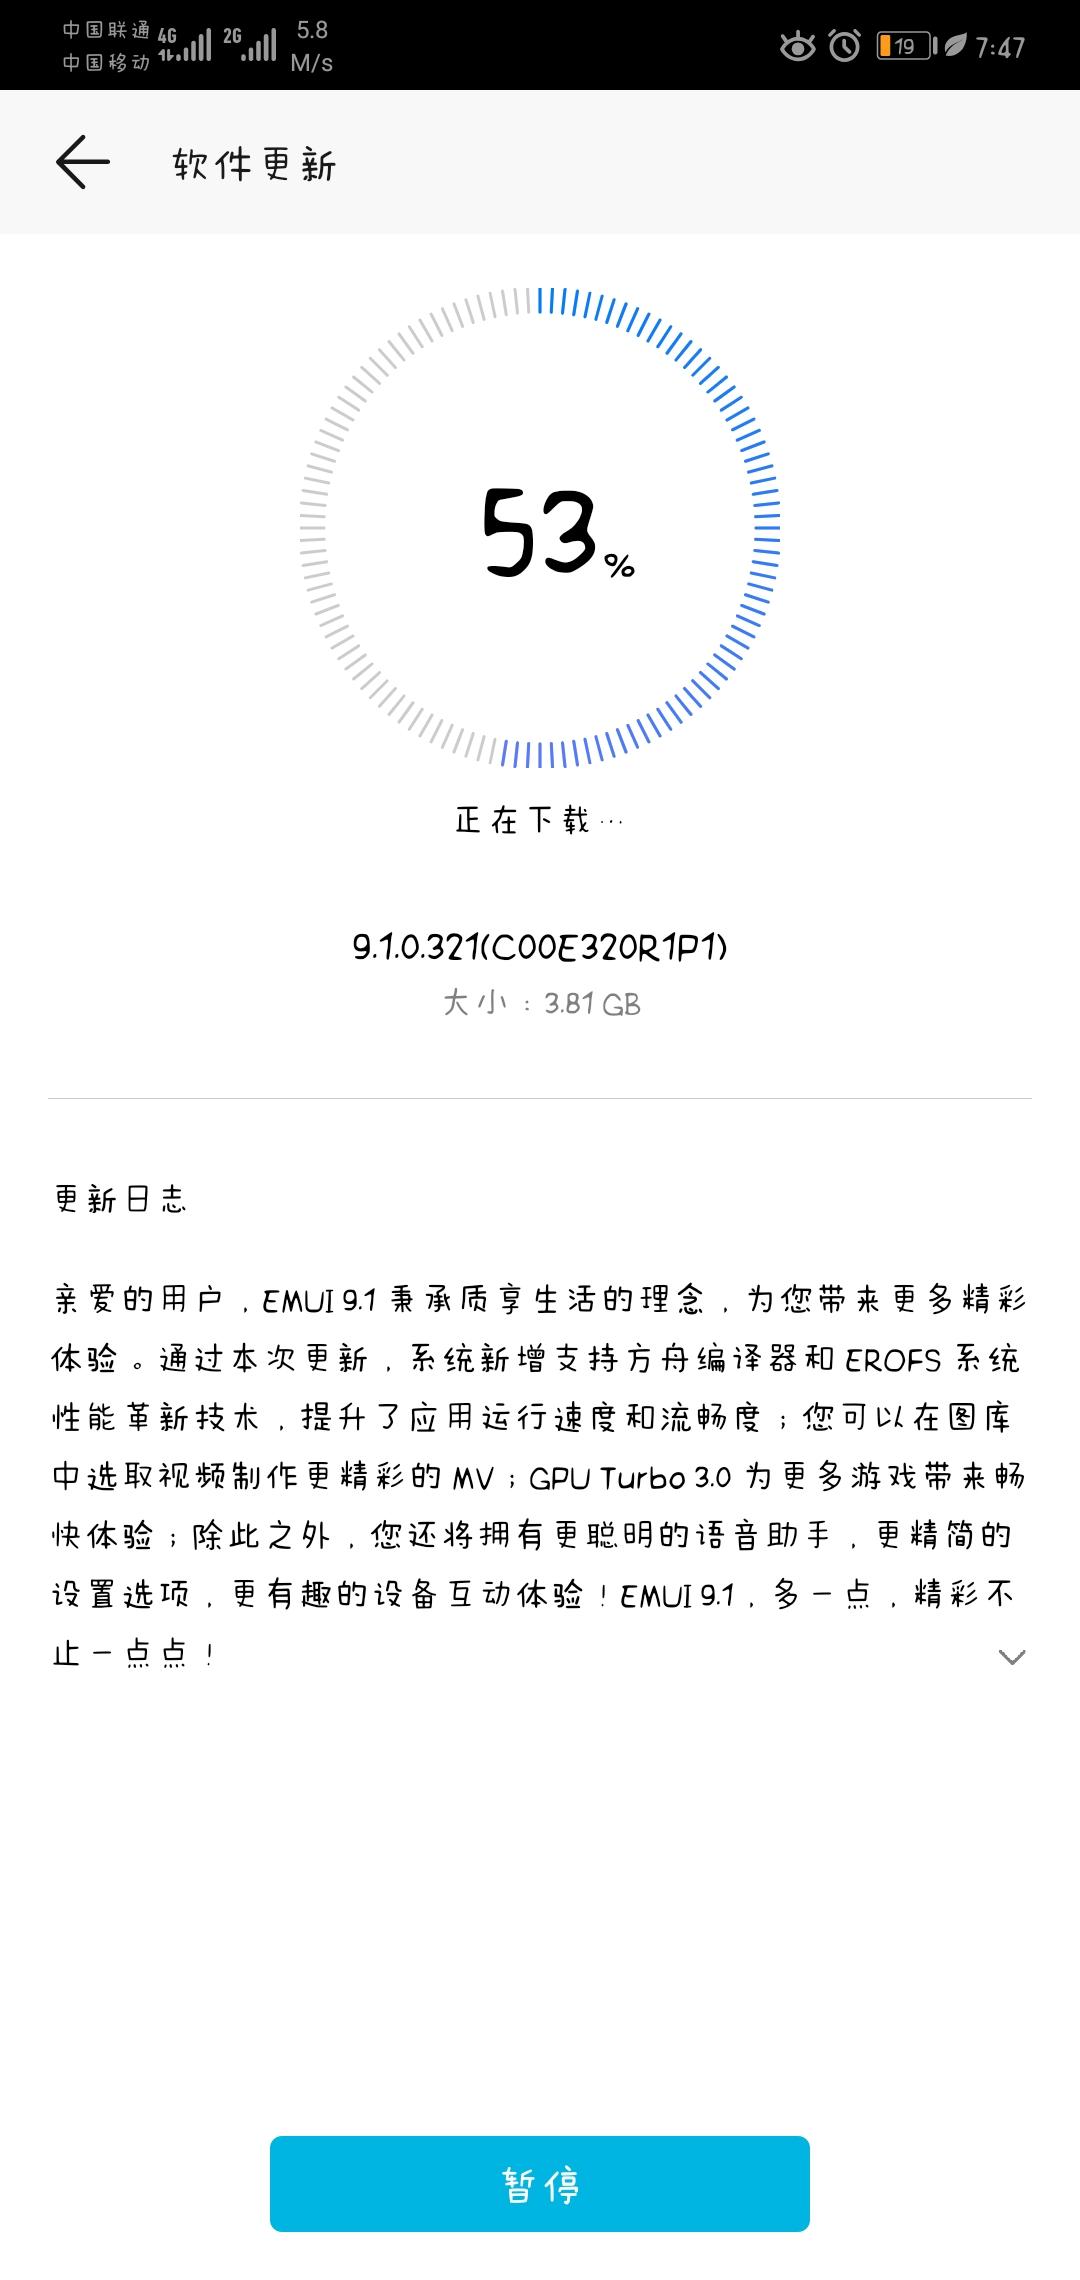 Screenshot_20190730_194713_com.huawei.android.hwouc.jpg